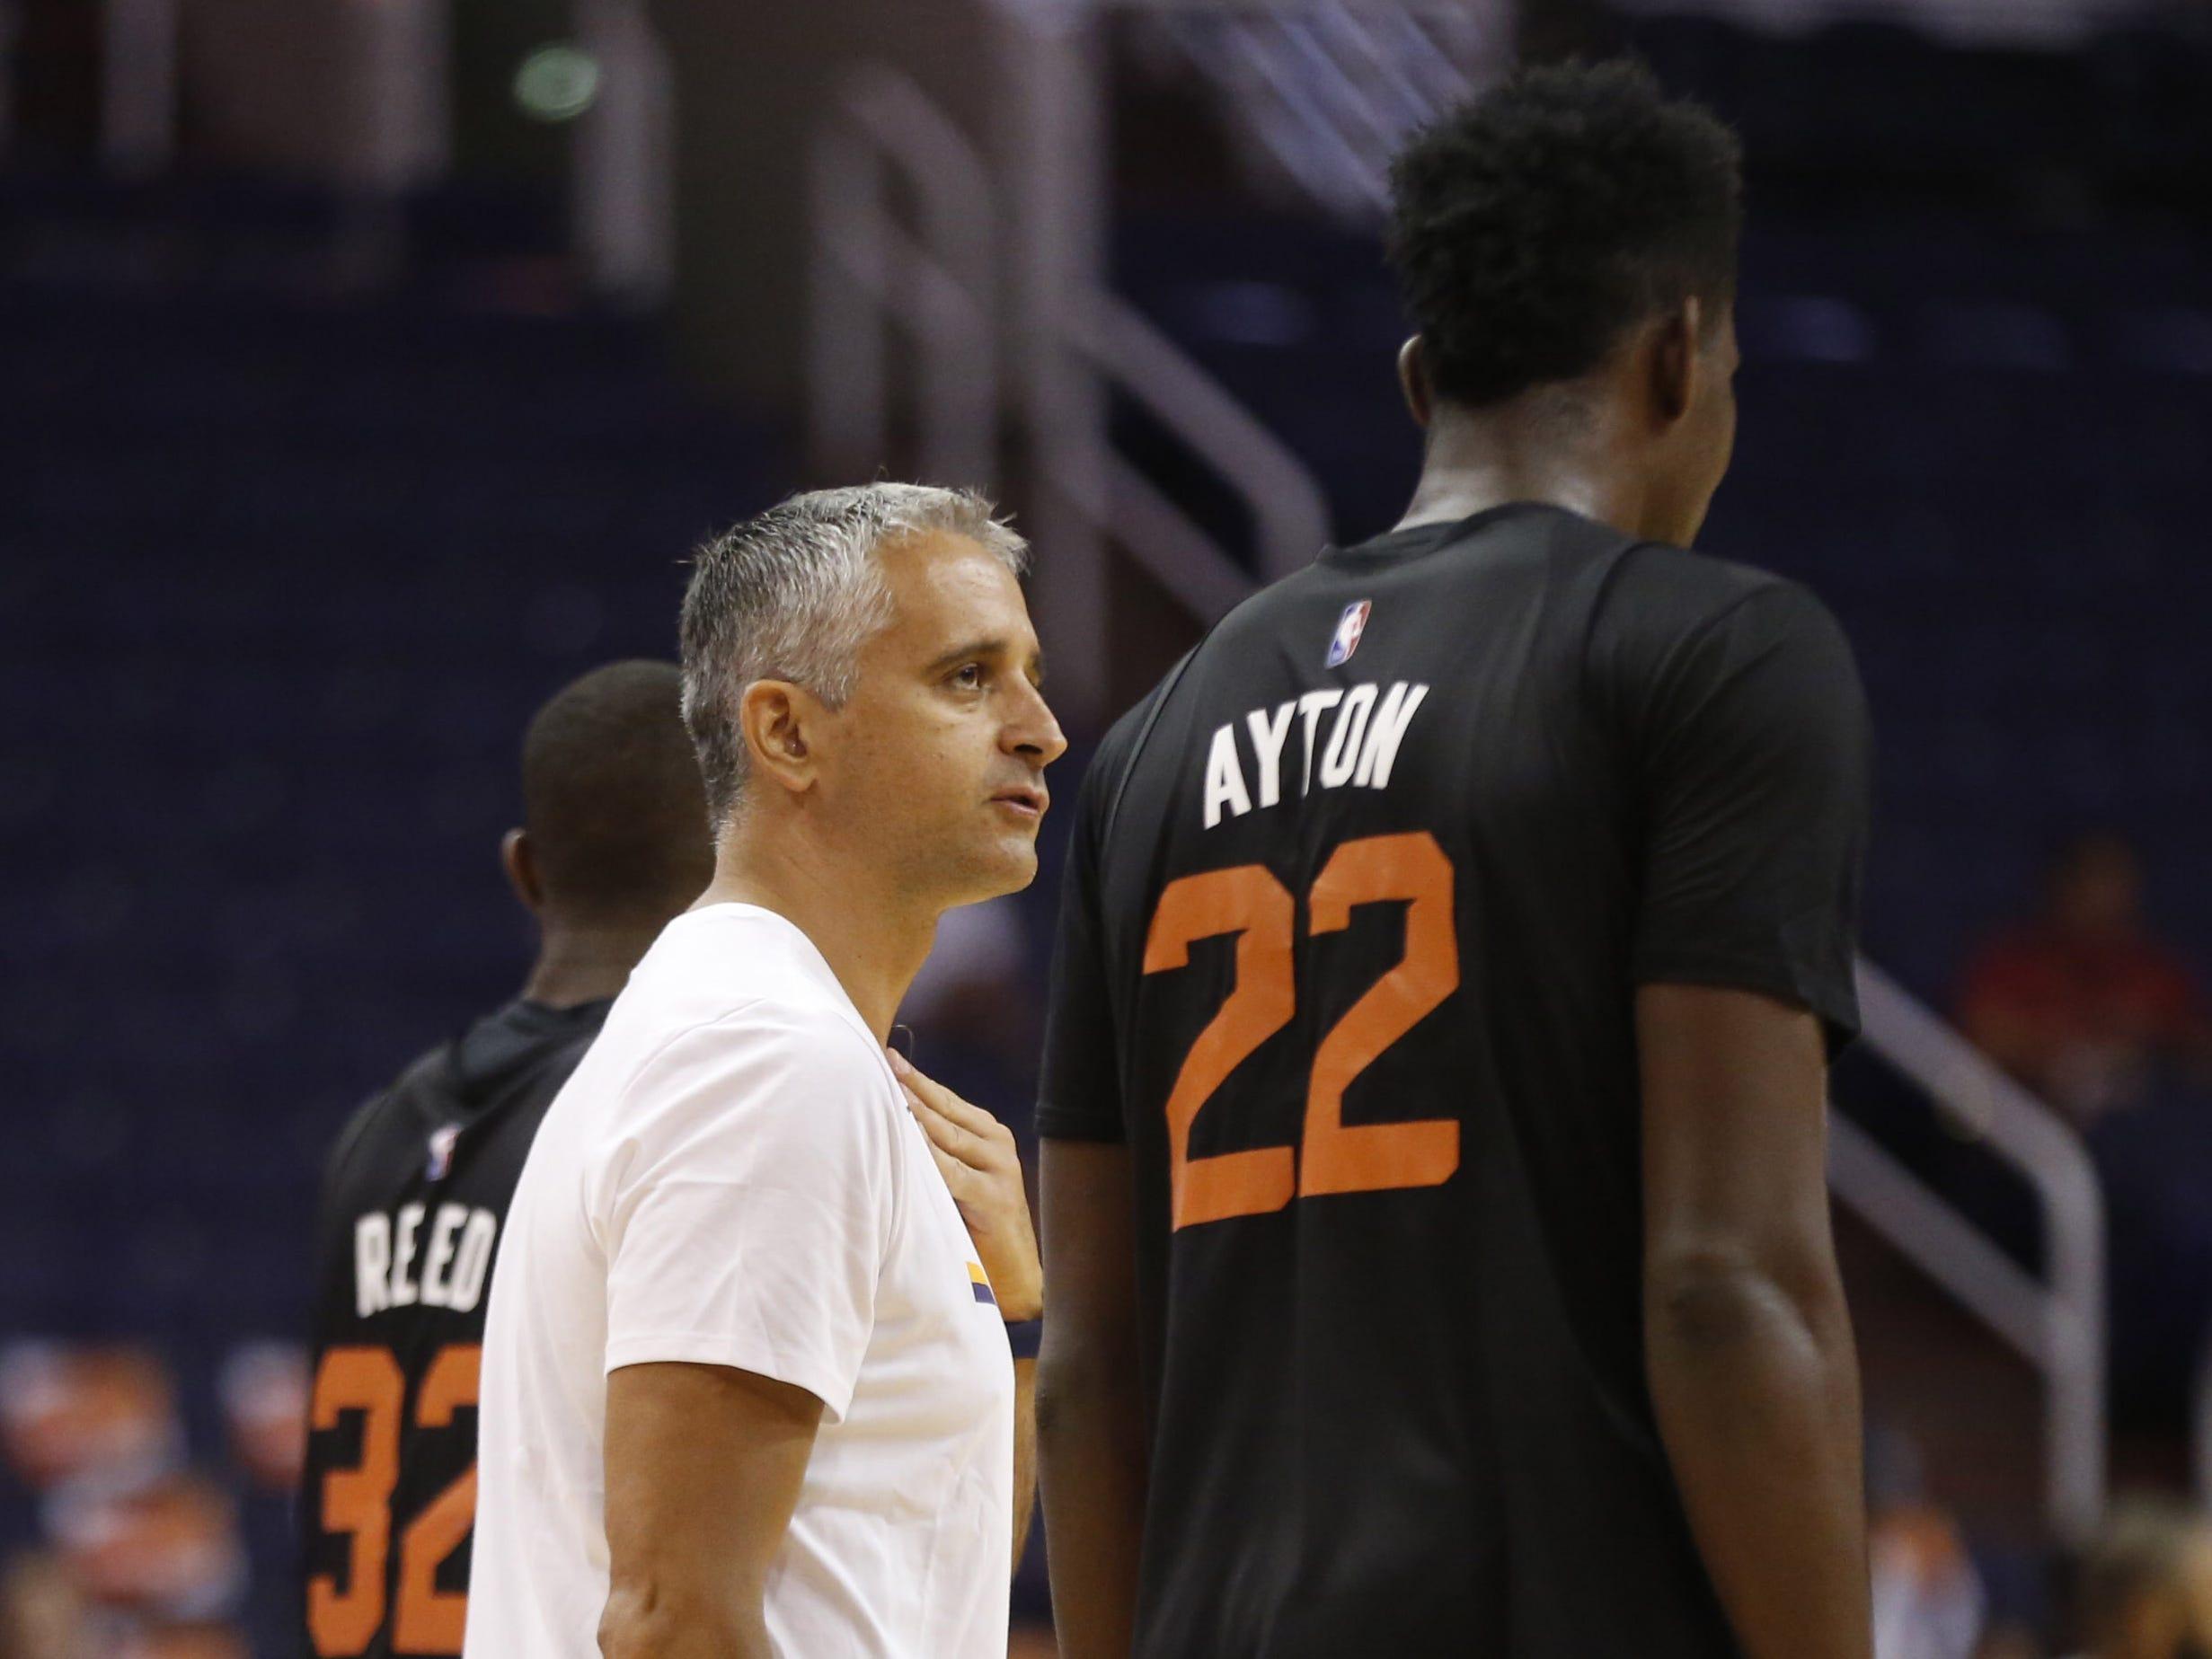 Suns head coach Igor Kokoškov talks with center Deandre Ayton during an Open Practice at Talking Stick Resort Arena in Phoenix, Ariz. on Sept. 29, 2018.